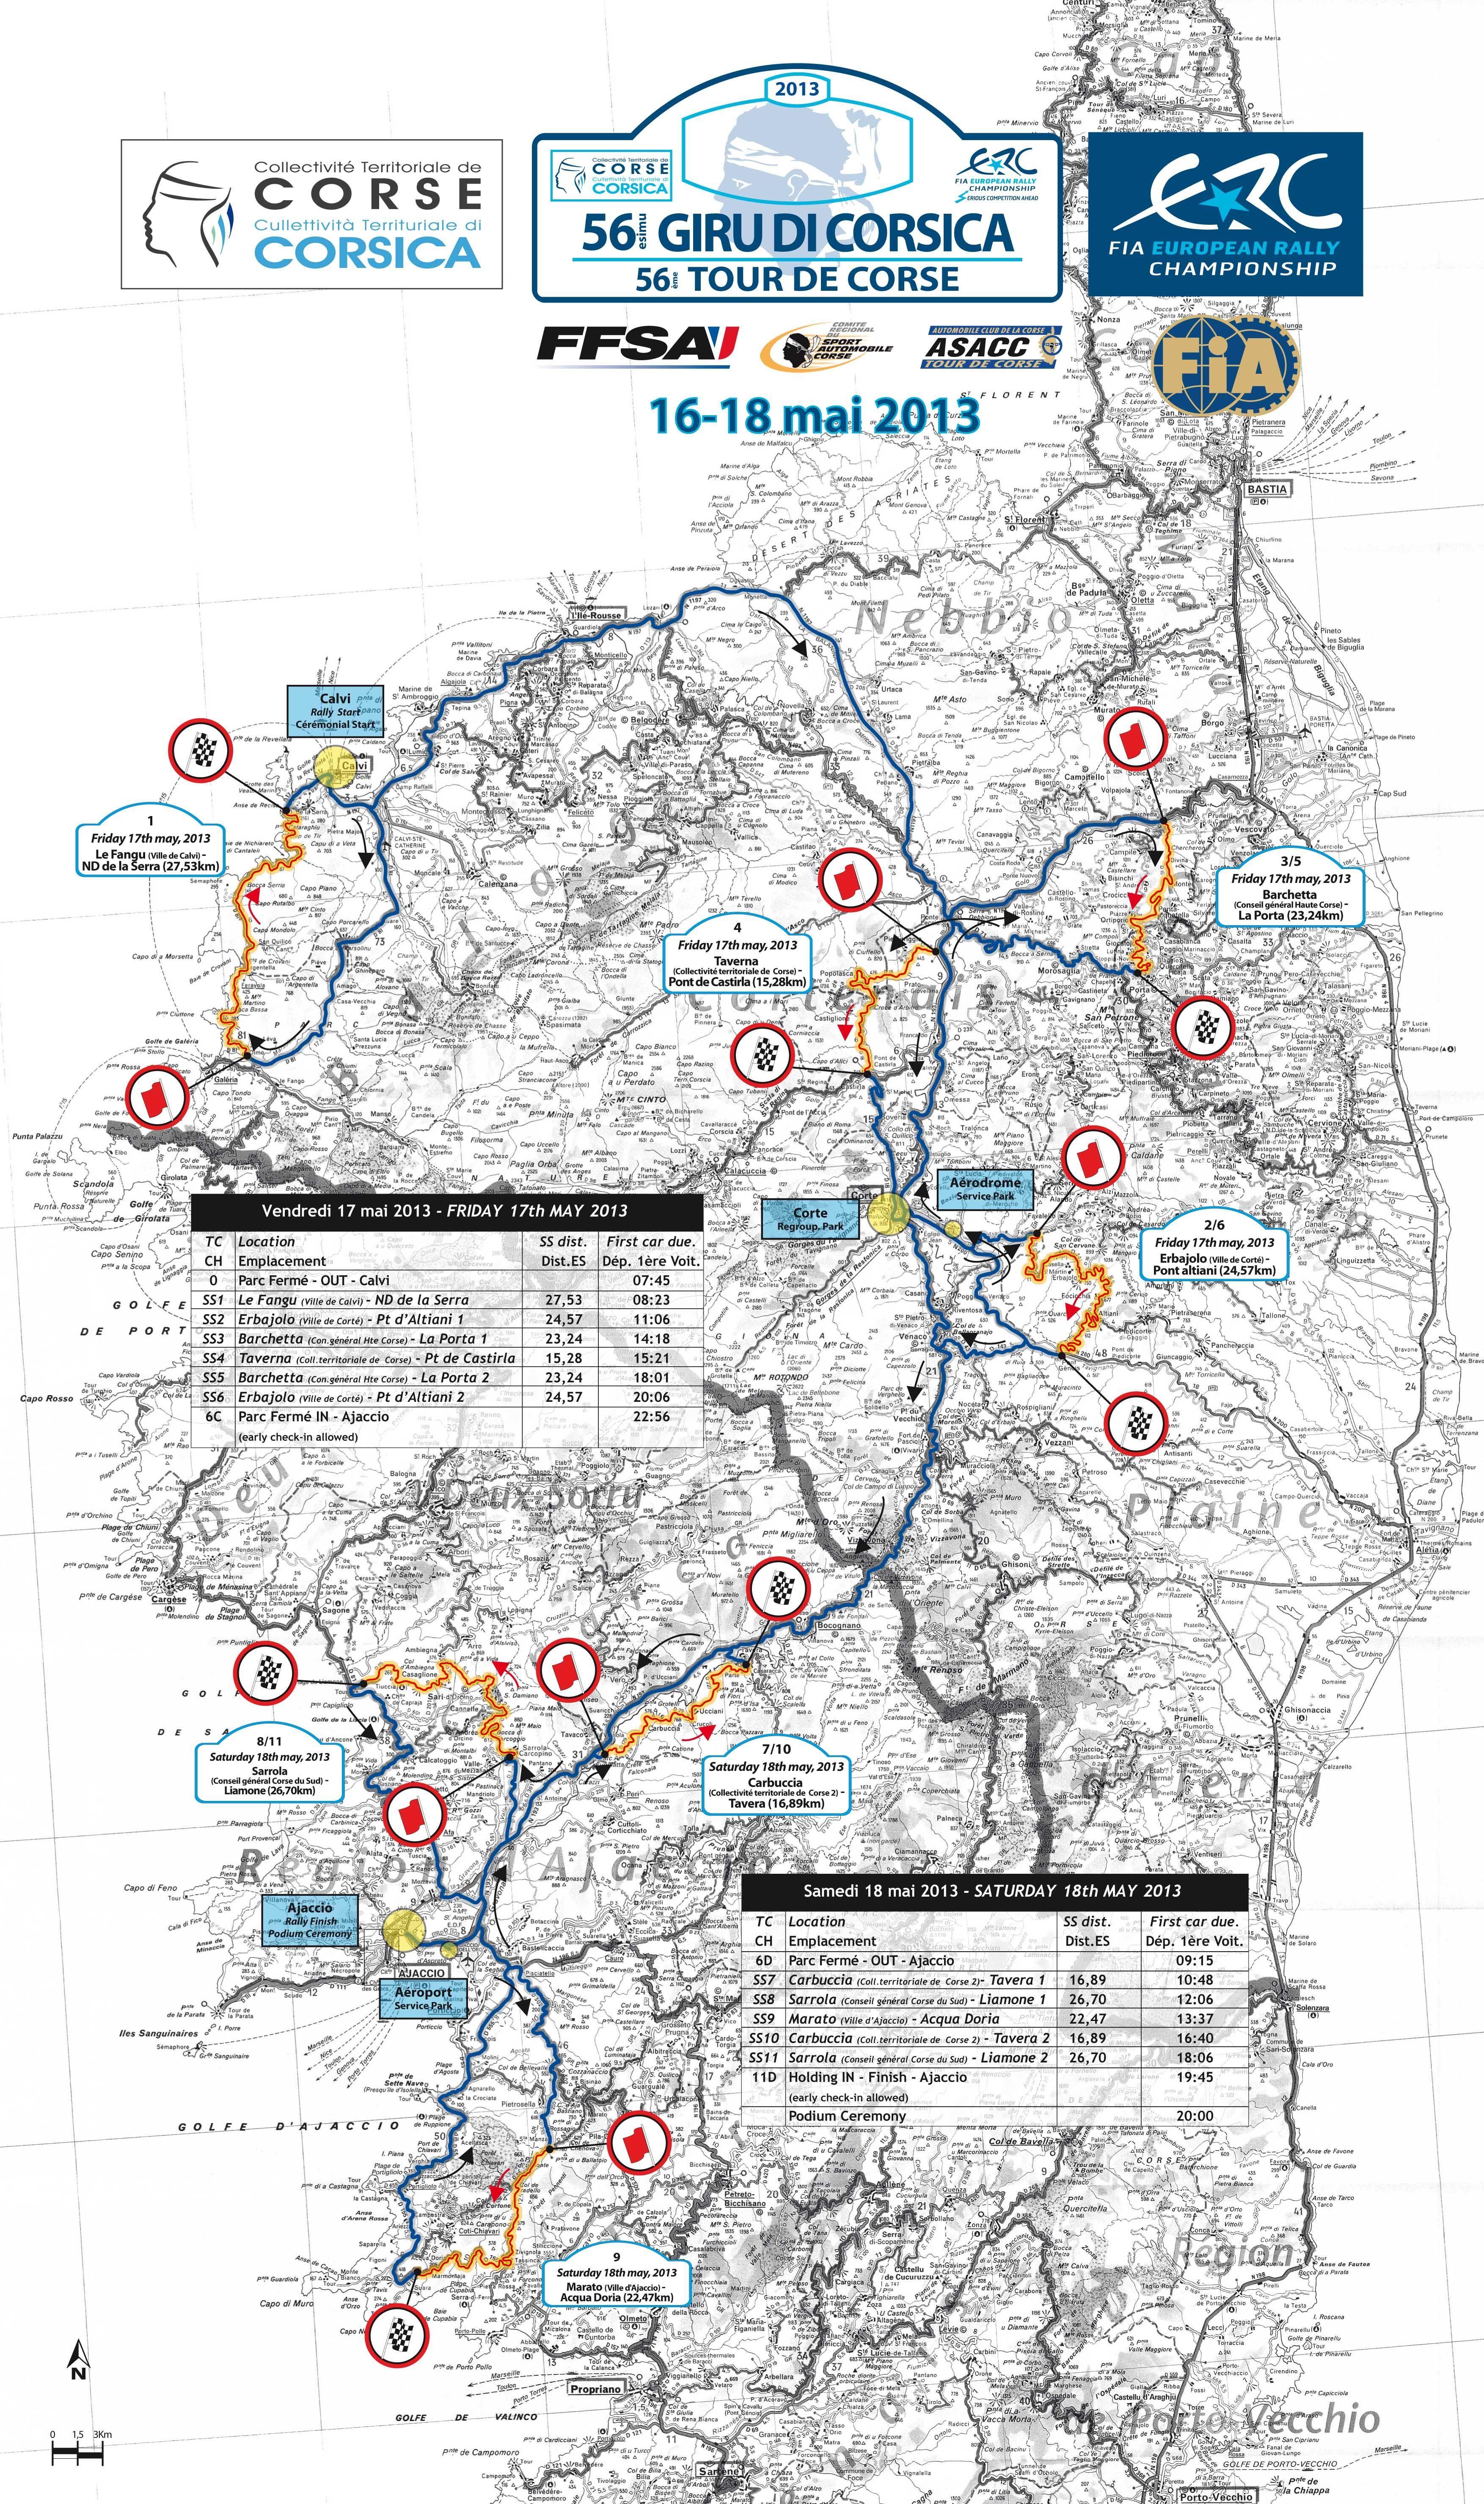 Du 16 au 18 mai, le 56 eme Giru di Corsica